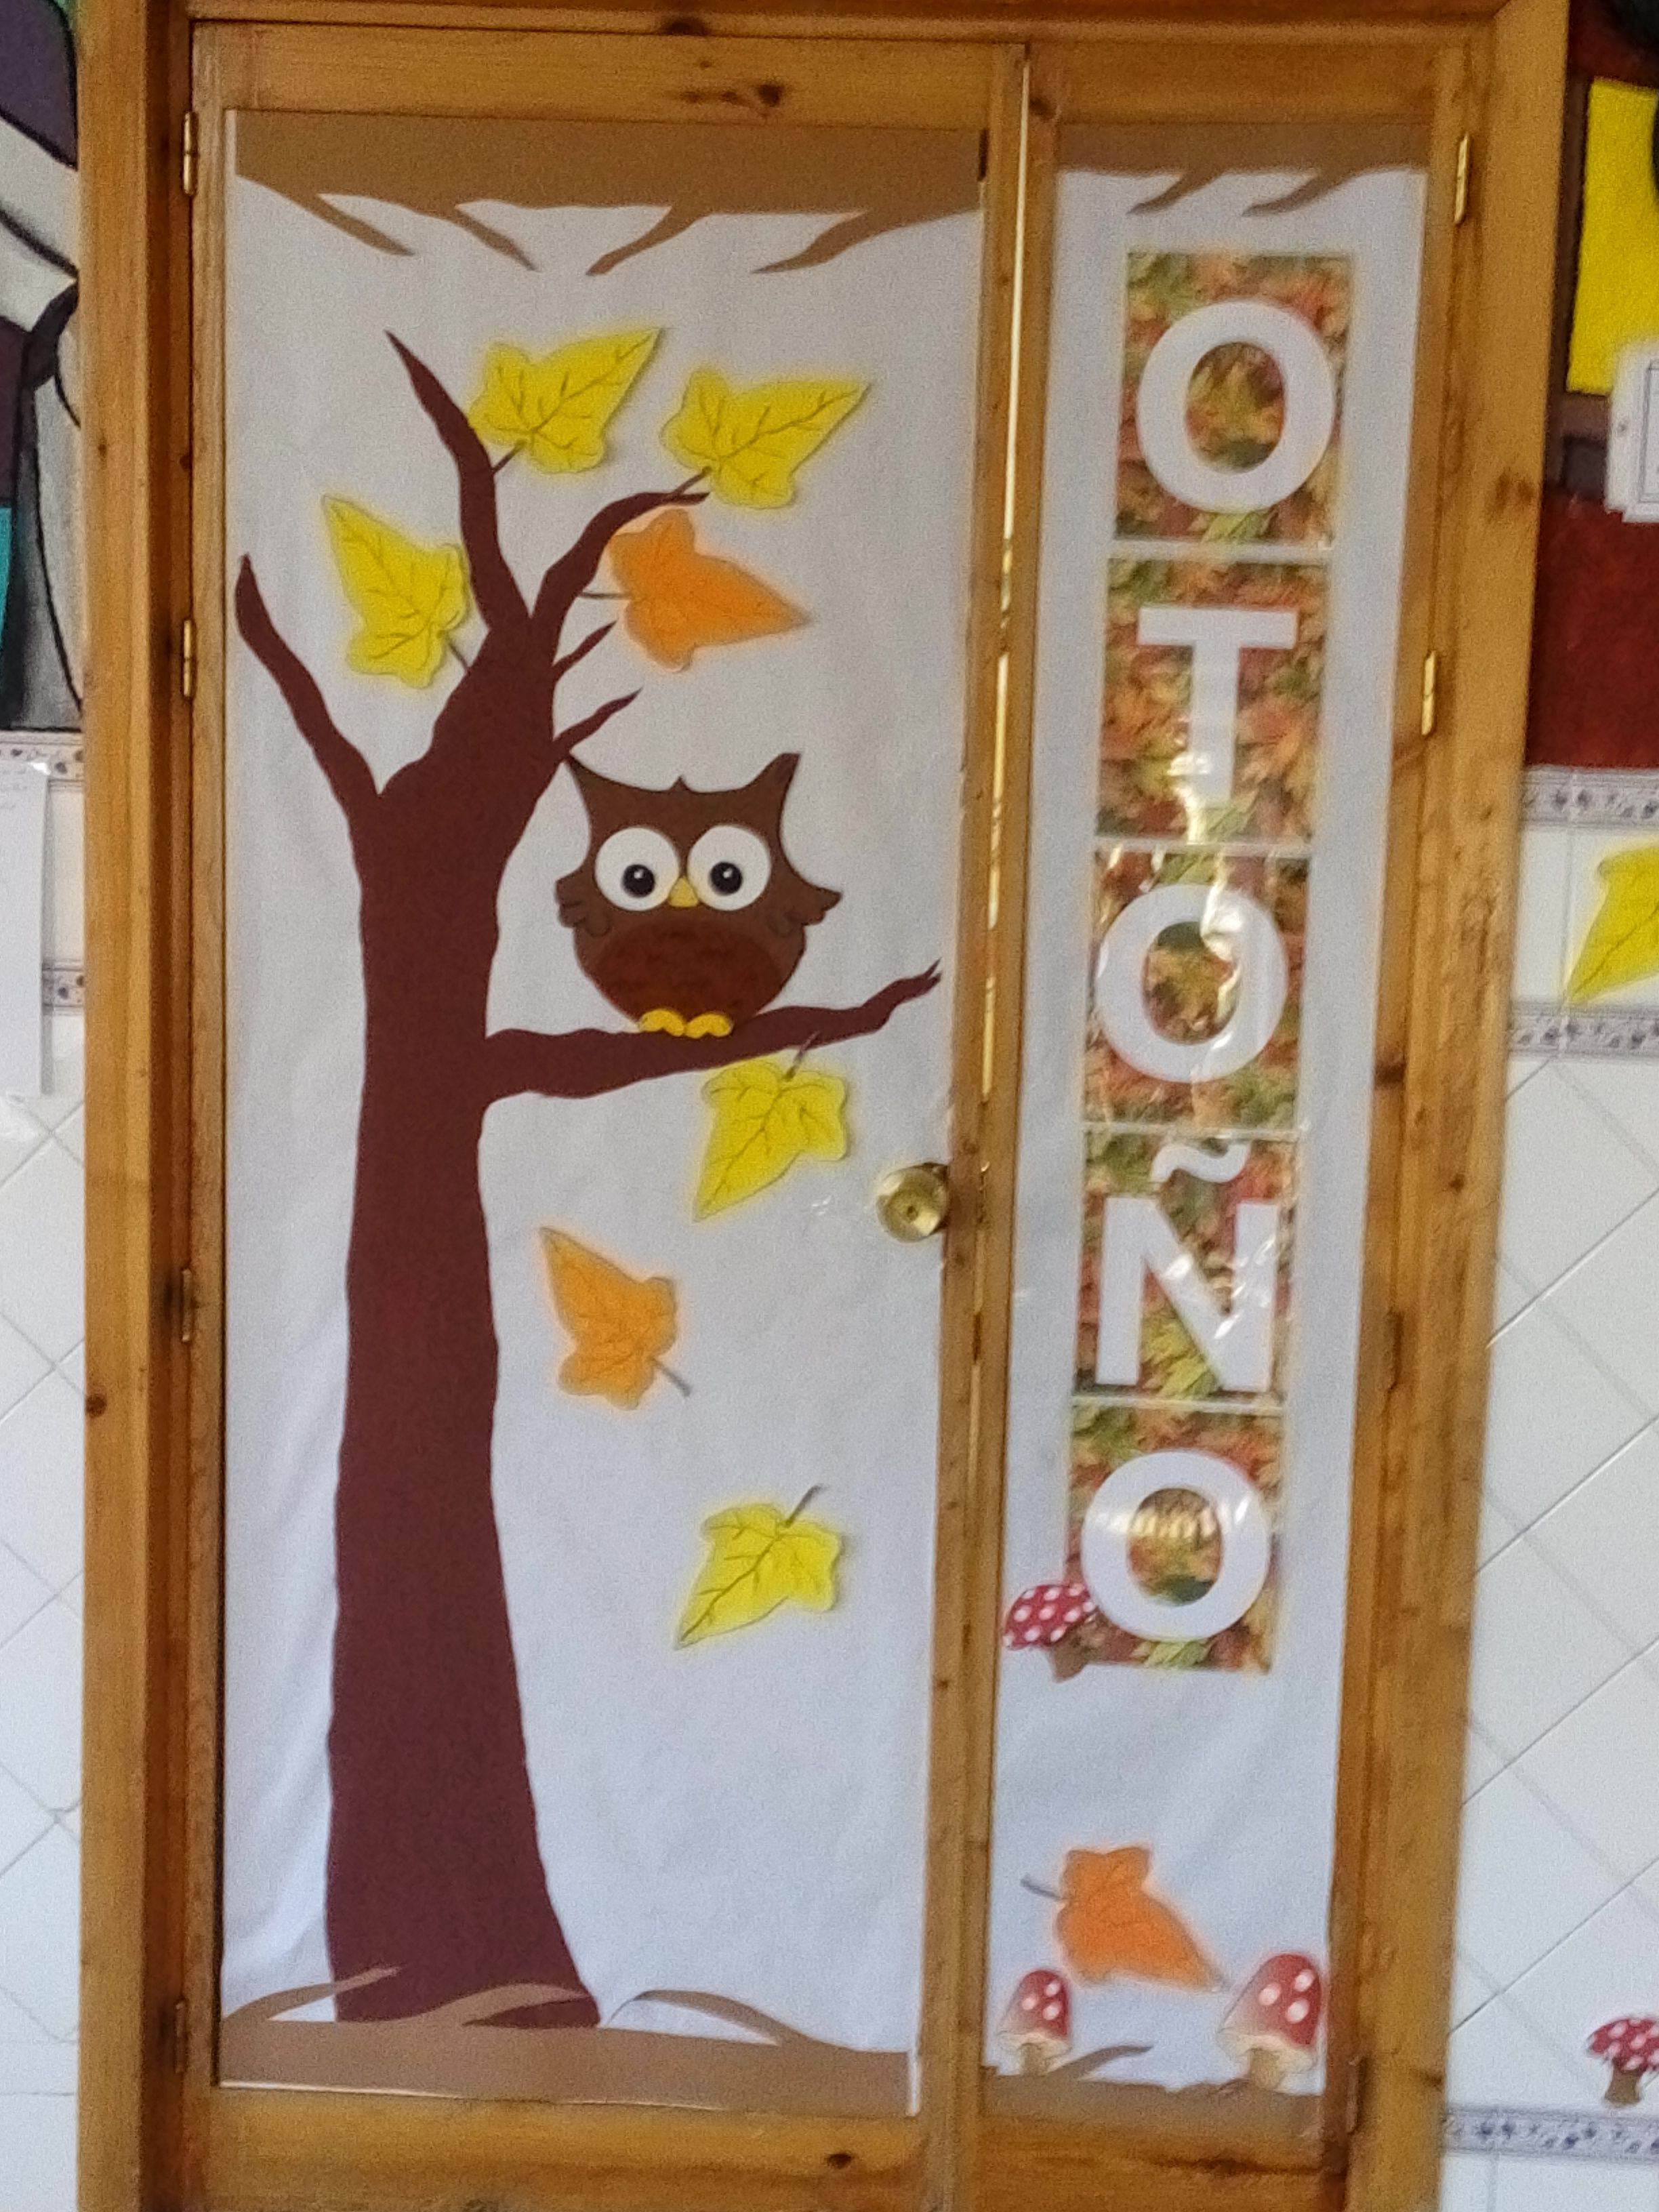 Puerta de la clase en oto o oto o pinterest puerta for Decoracion puerta otono